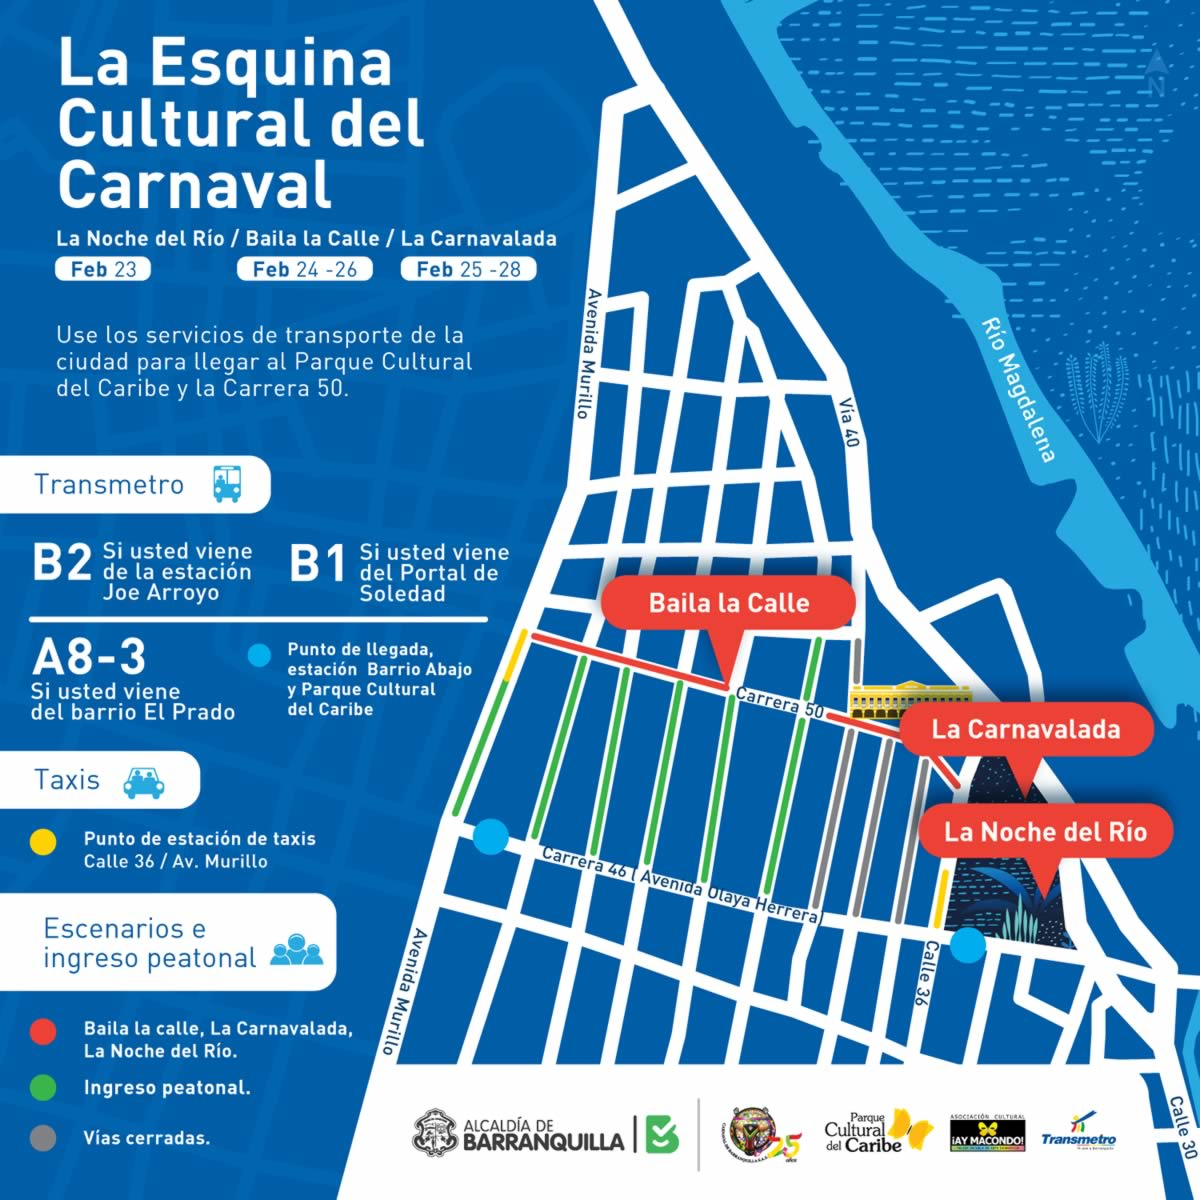 El Parque Cultural del Caribe y la Carrera 50, listos para ser la Esquina Cultural del Carnaval